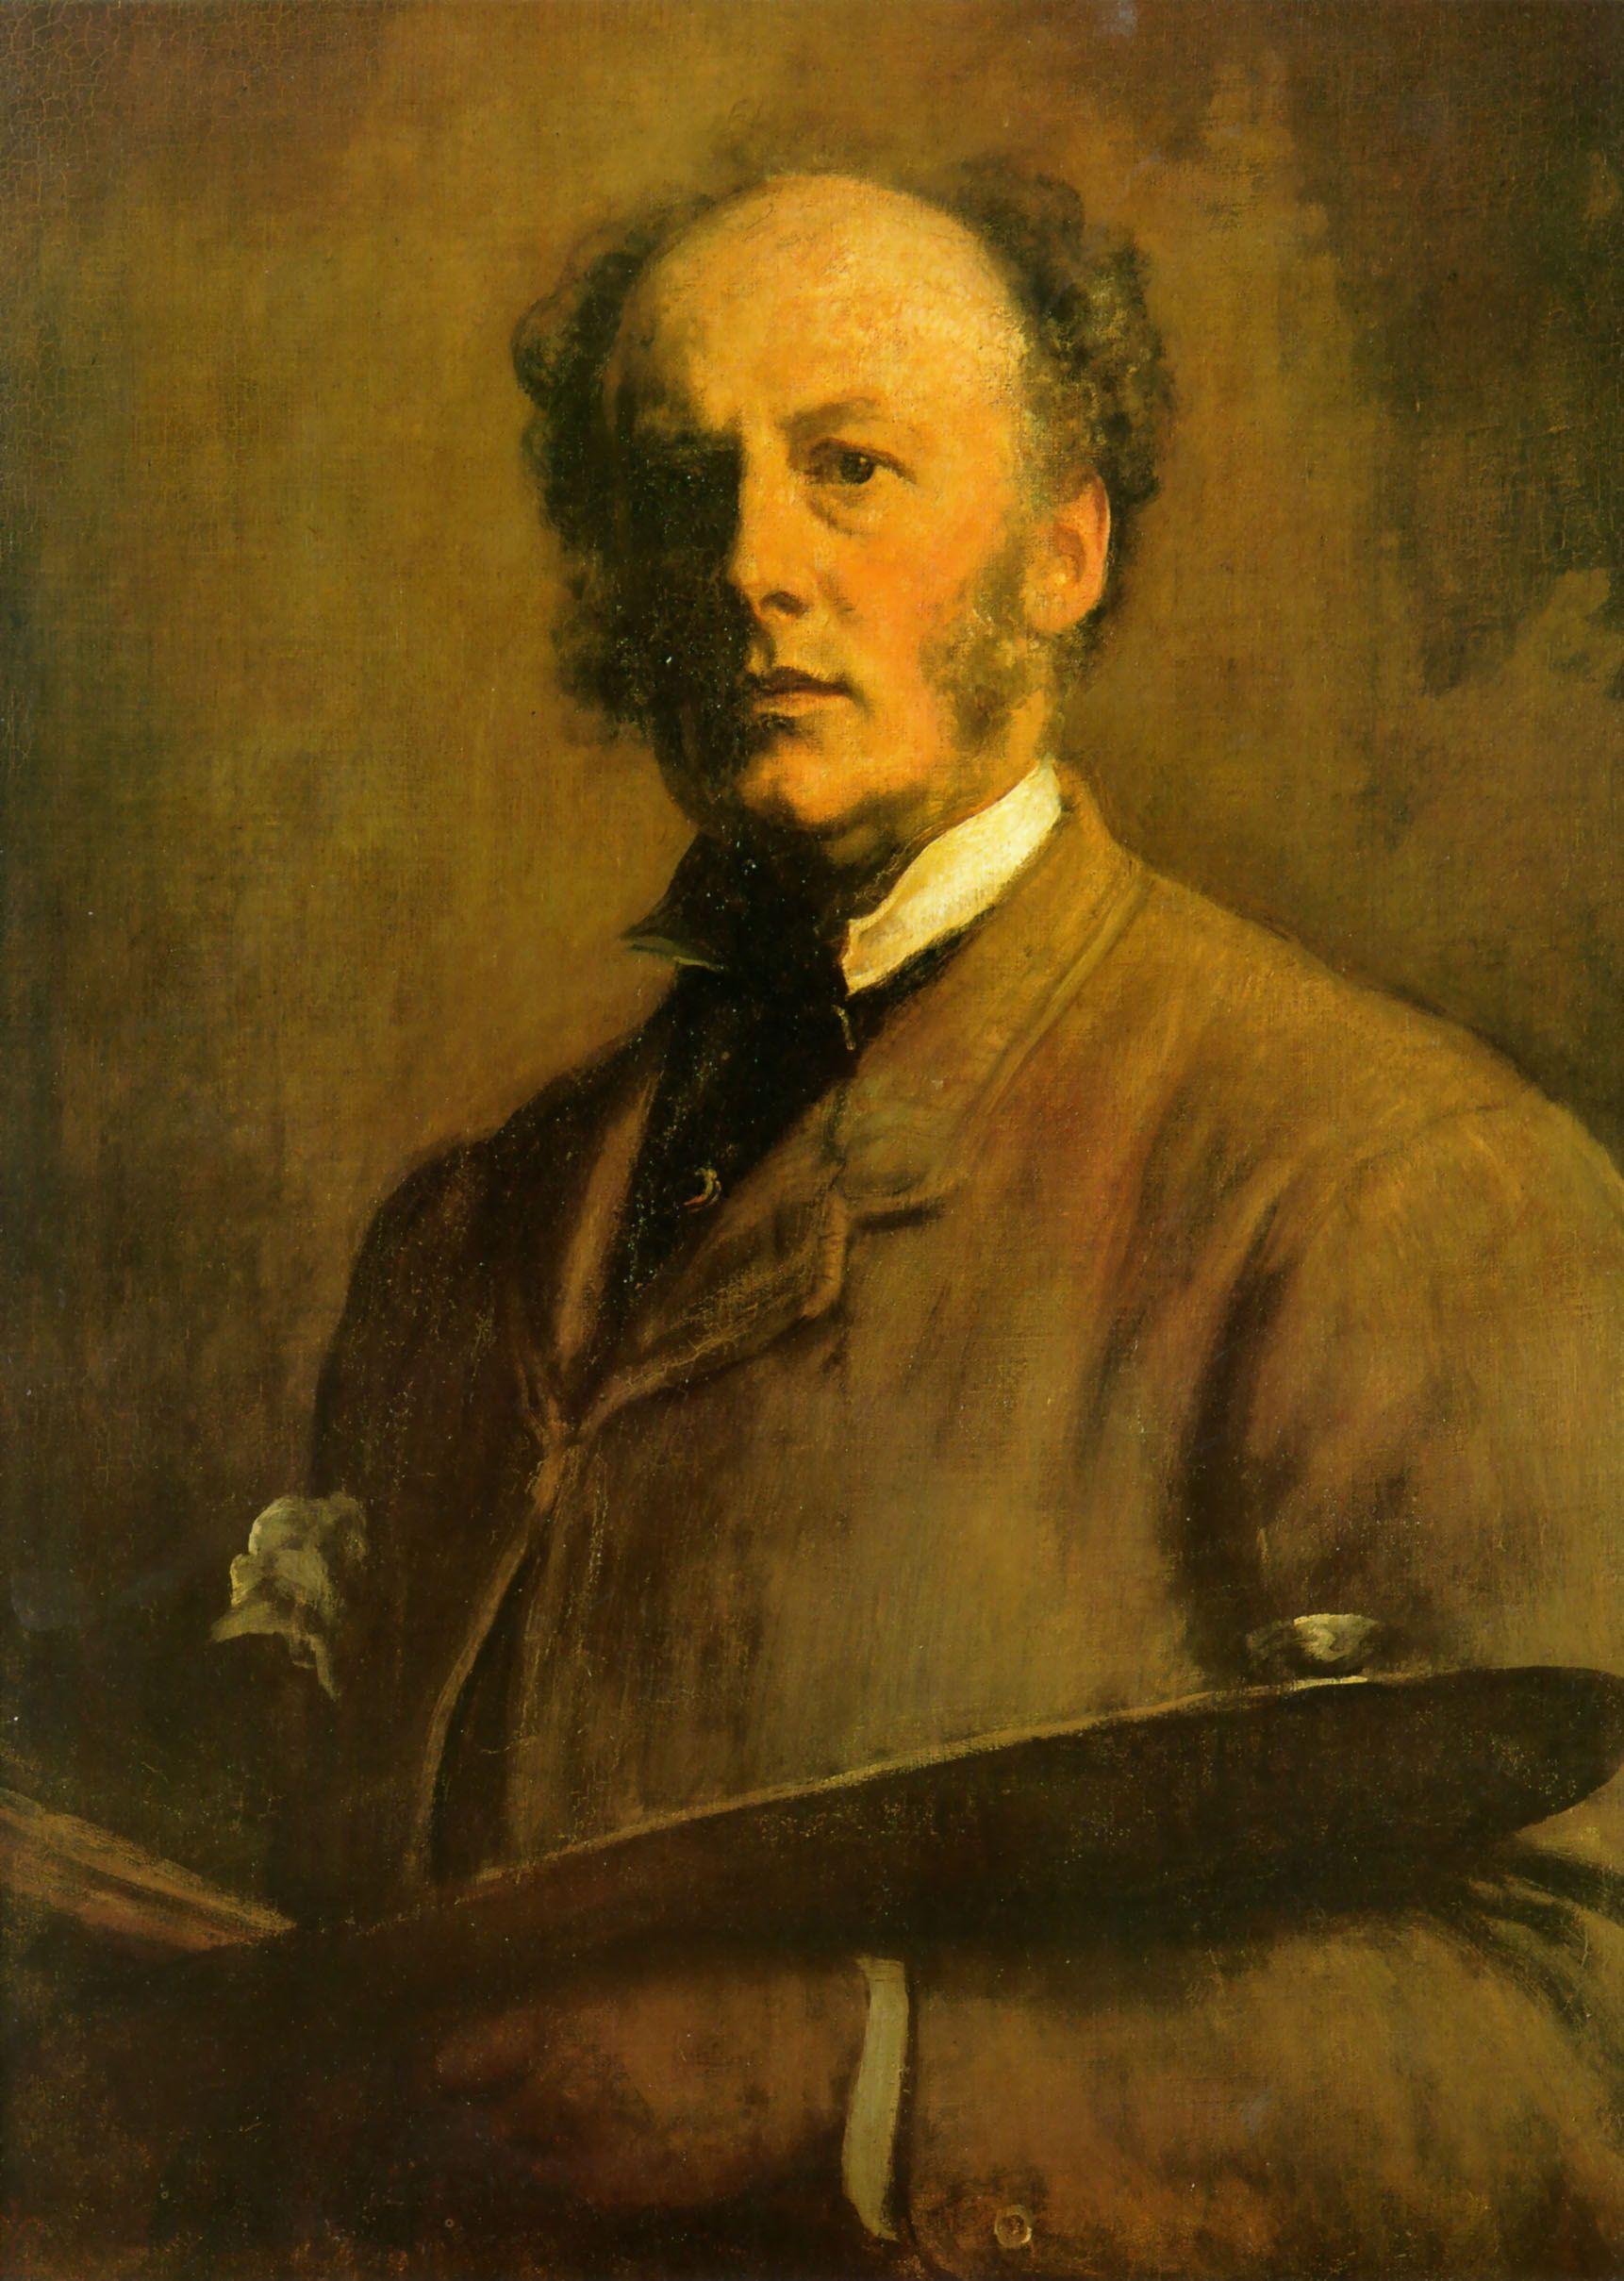 Sir John Everett Millais, self portrait. Born 8 June 1829, Southampton, England.  Died13 August 1896 (aged 67)  Kensington, London.